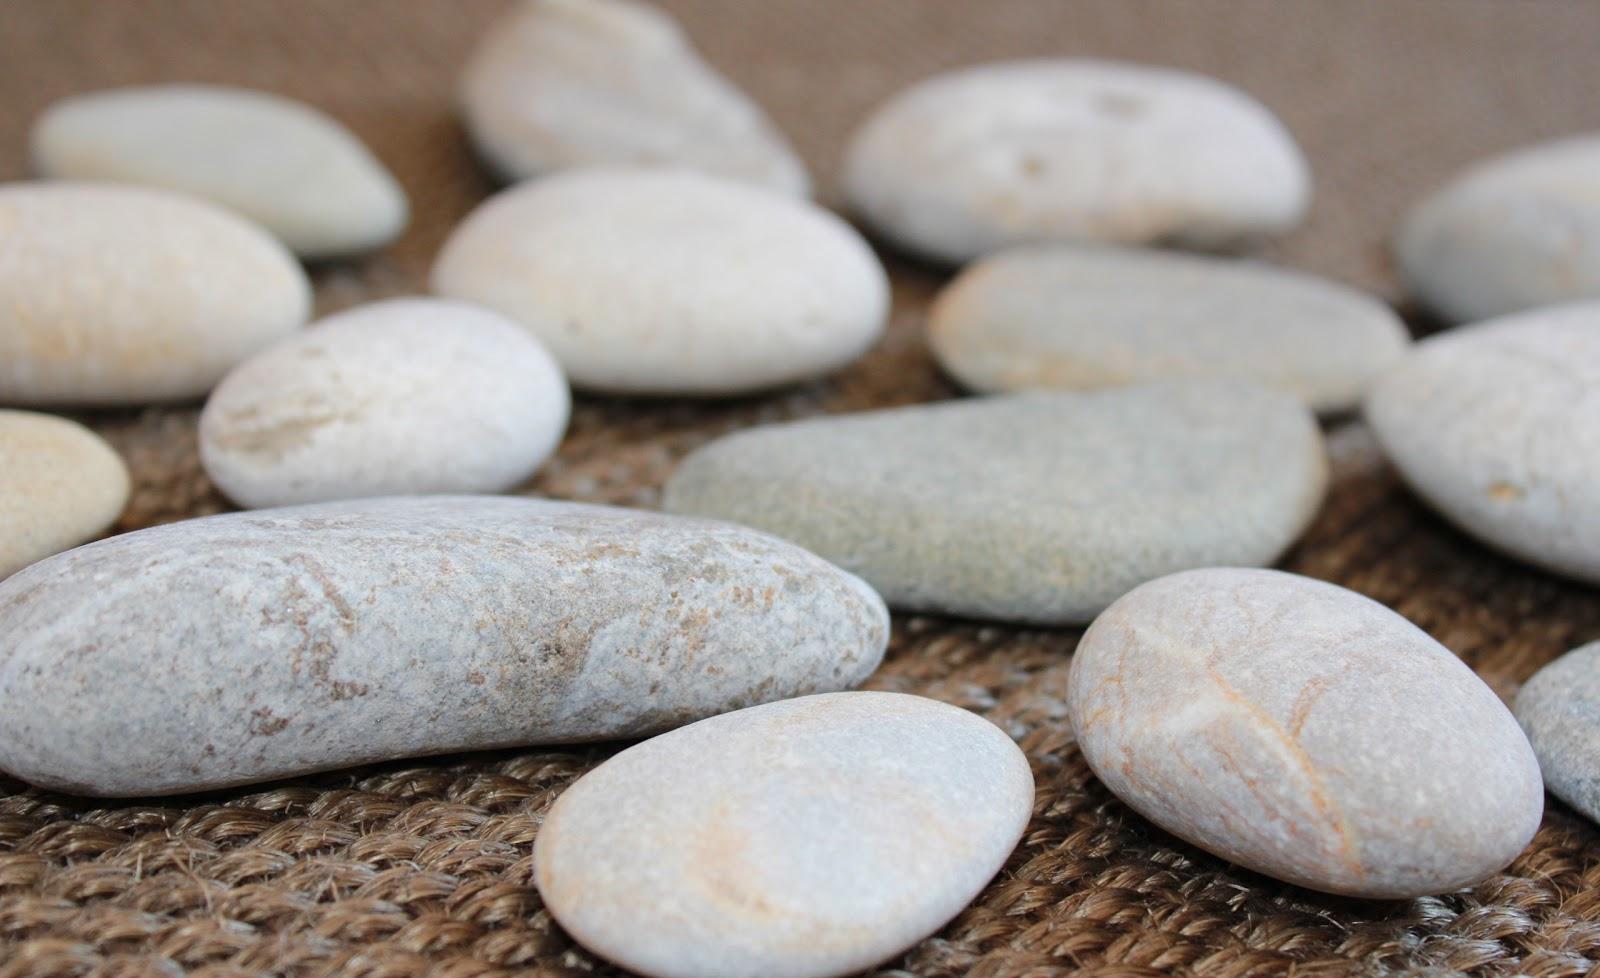 Nueve pinceladas pintando piedras for Como pintar piedras